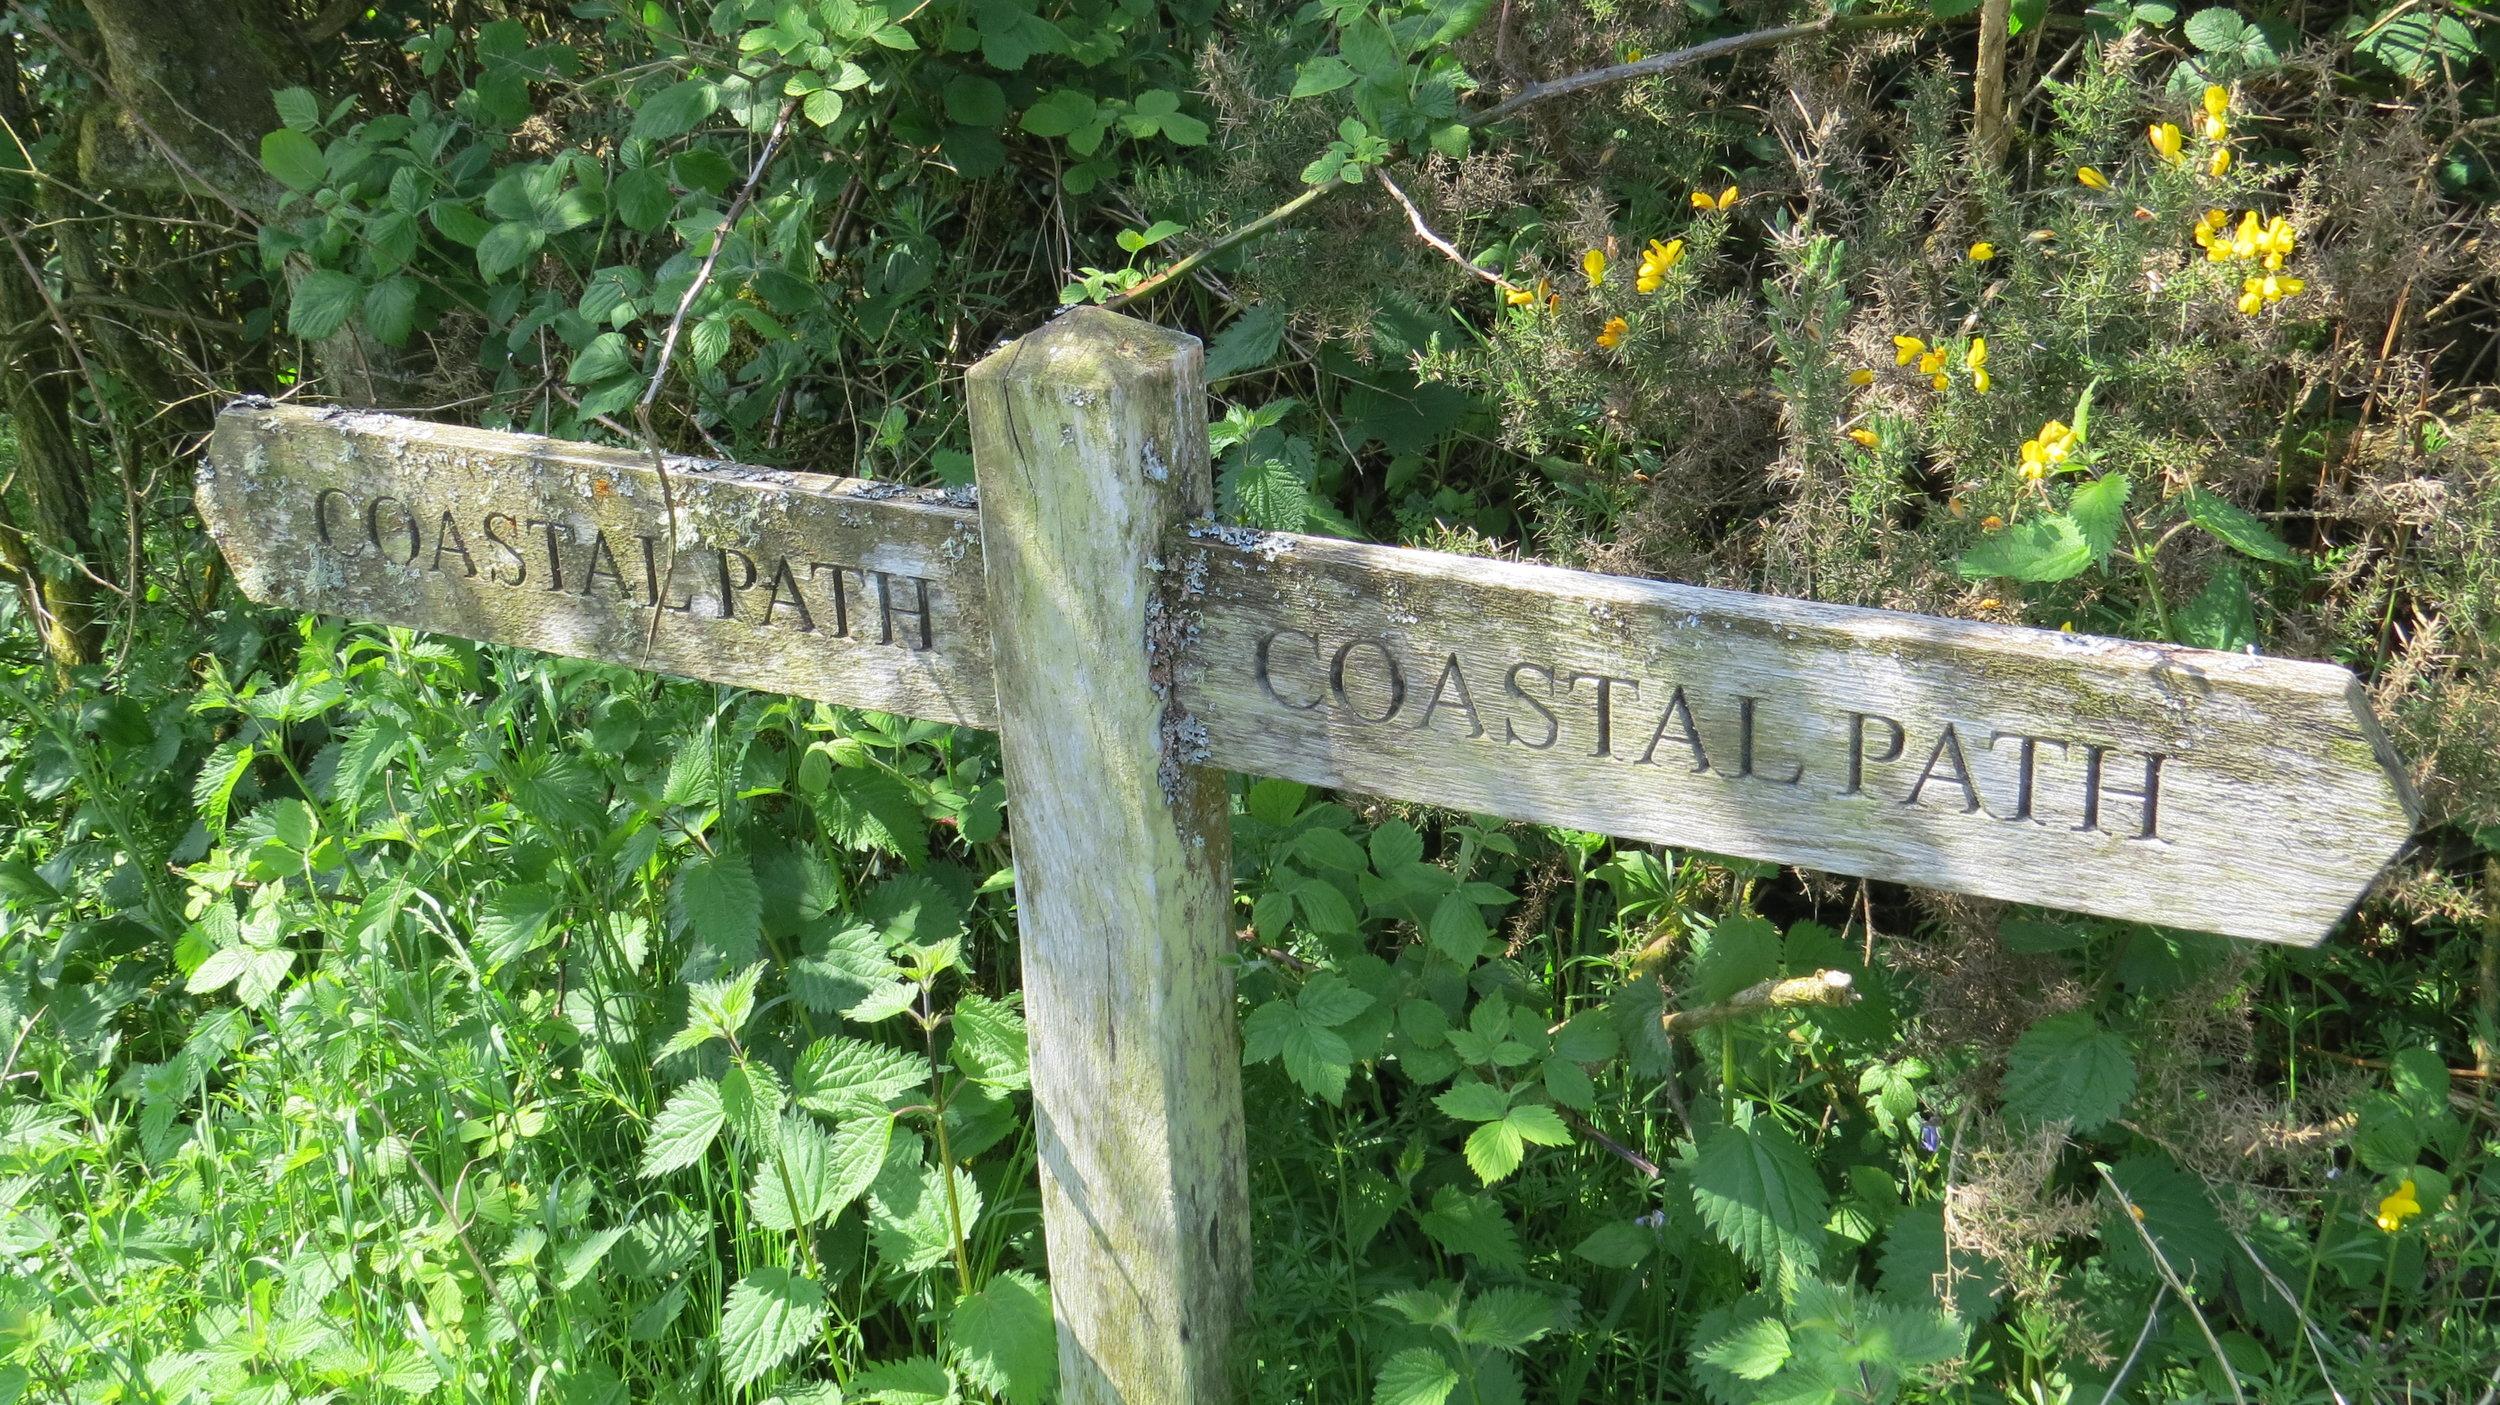 Which ways the Coast Path?